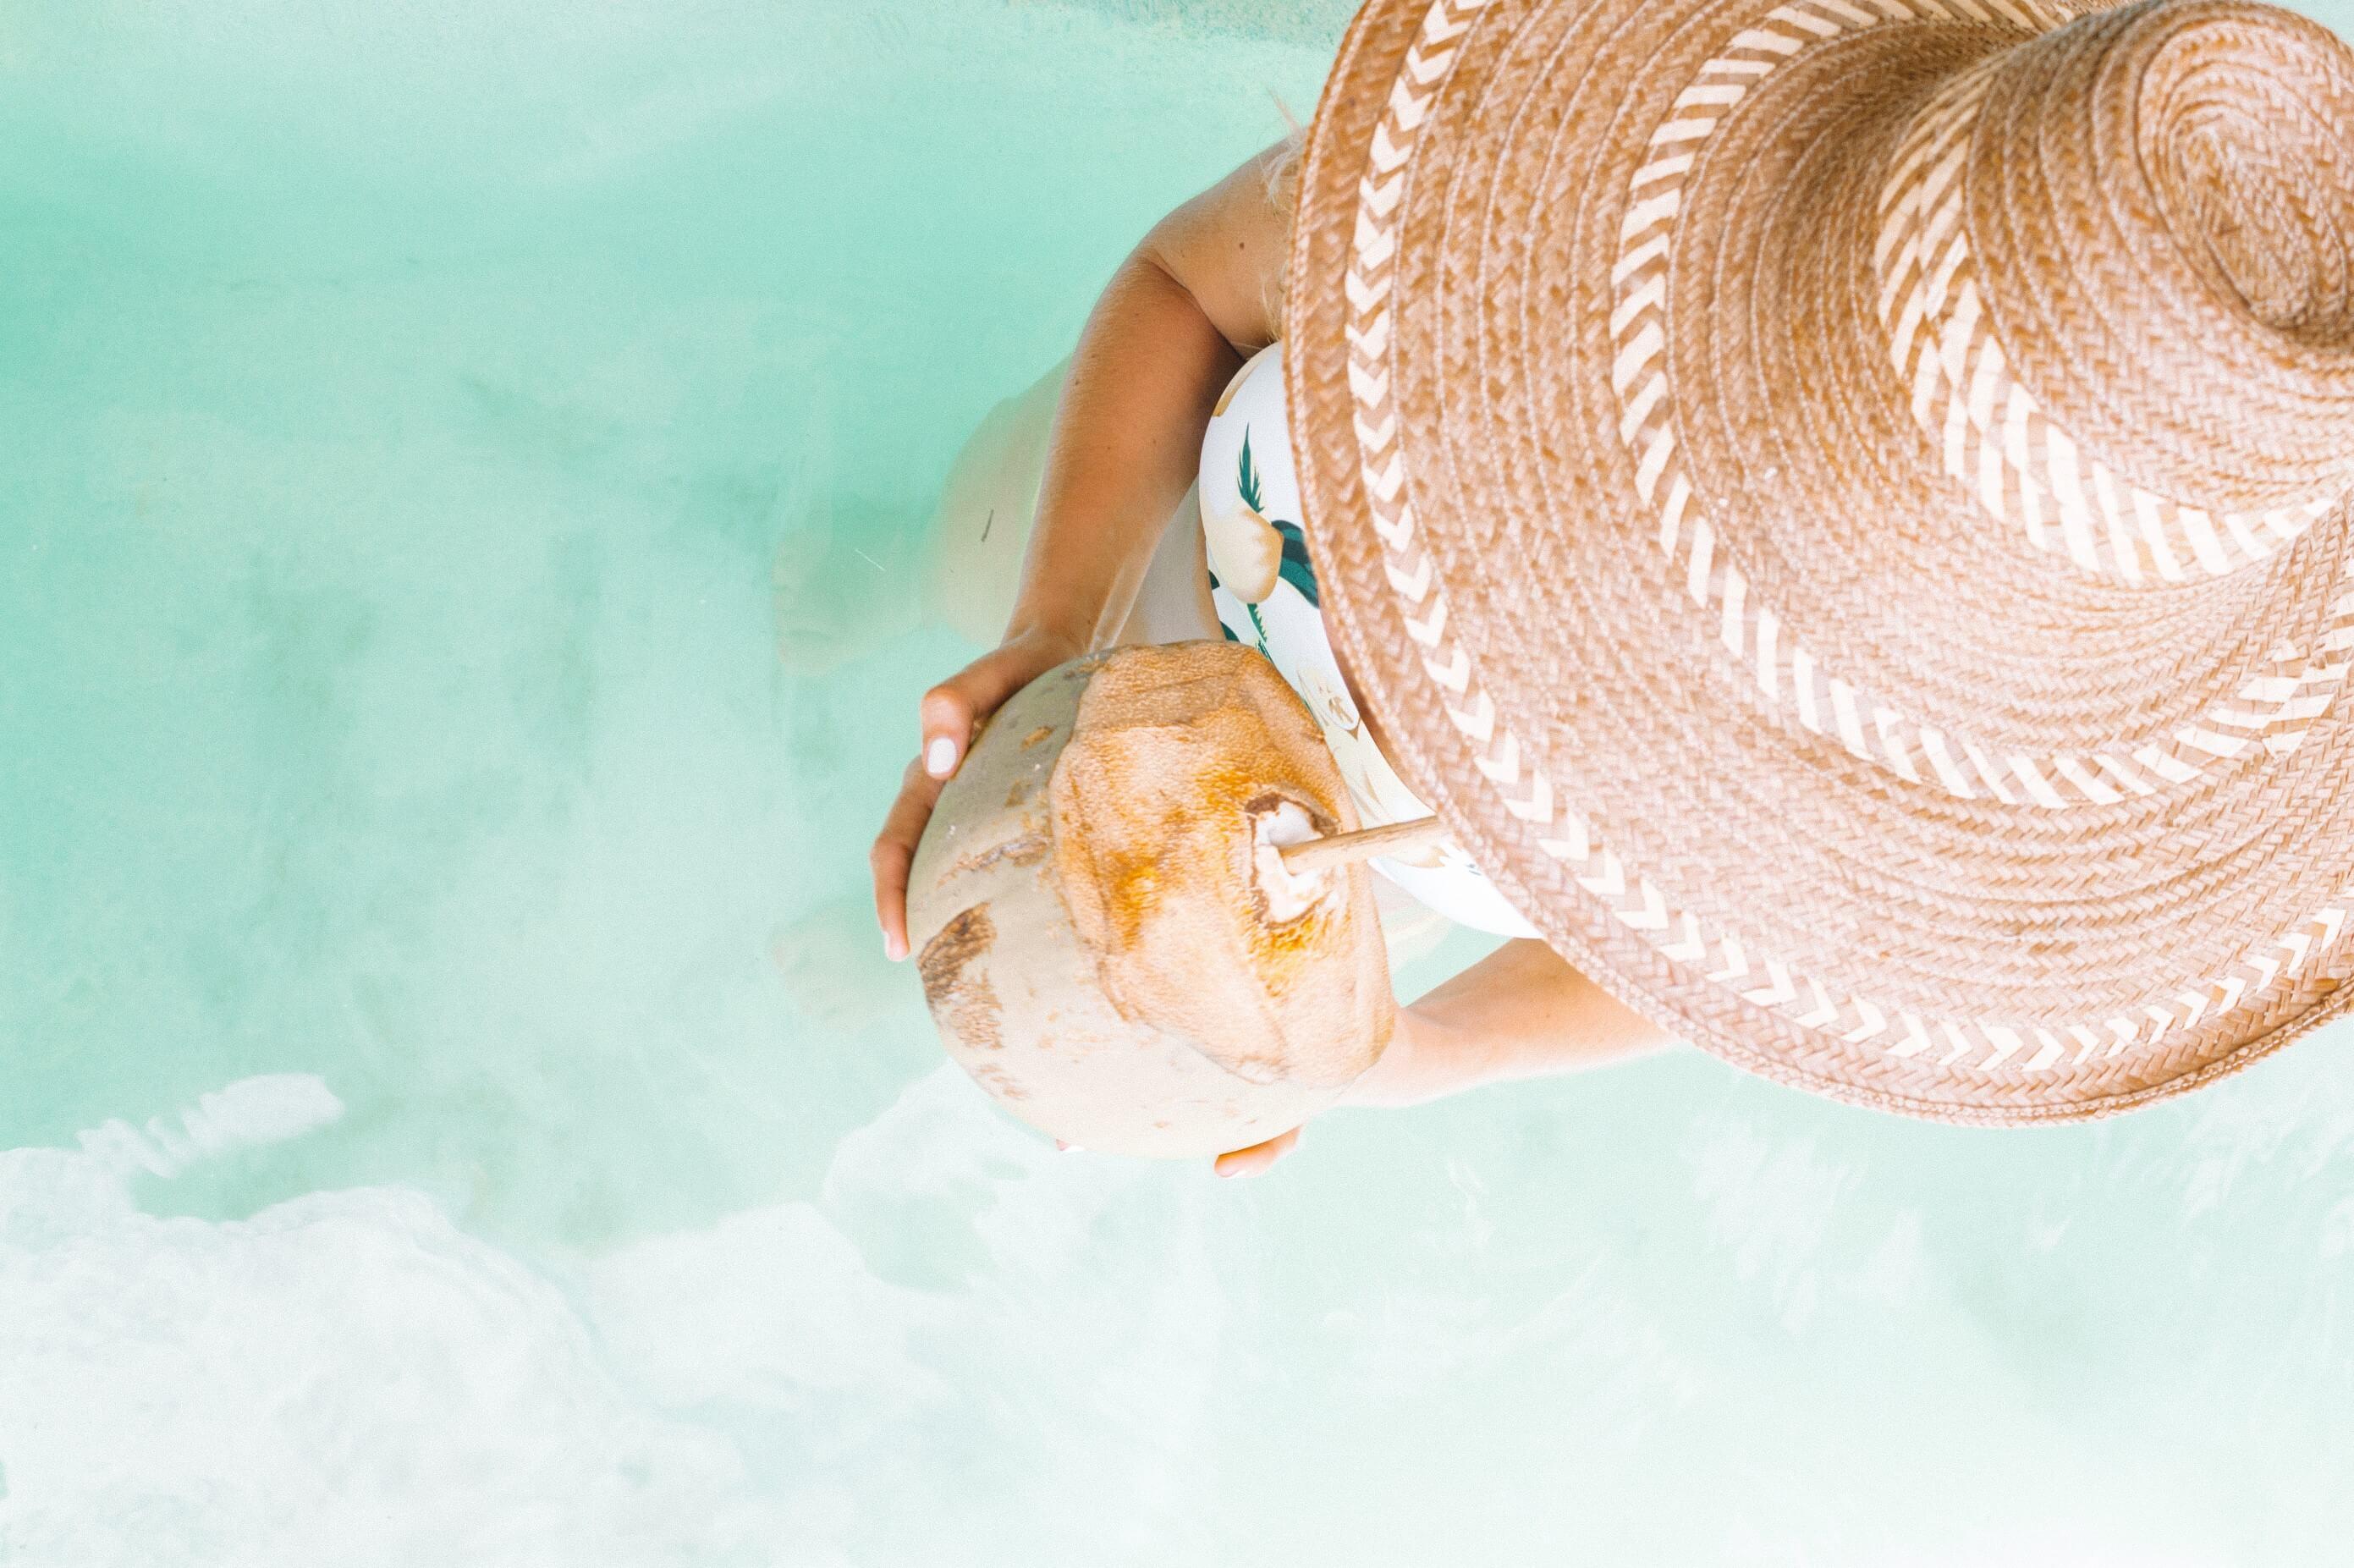 Curaçao Tech Meetups | Lady drinking coconut water